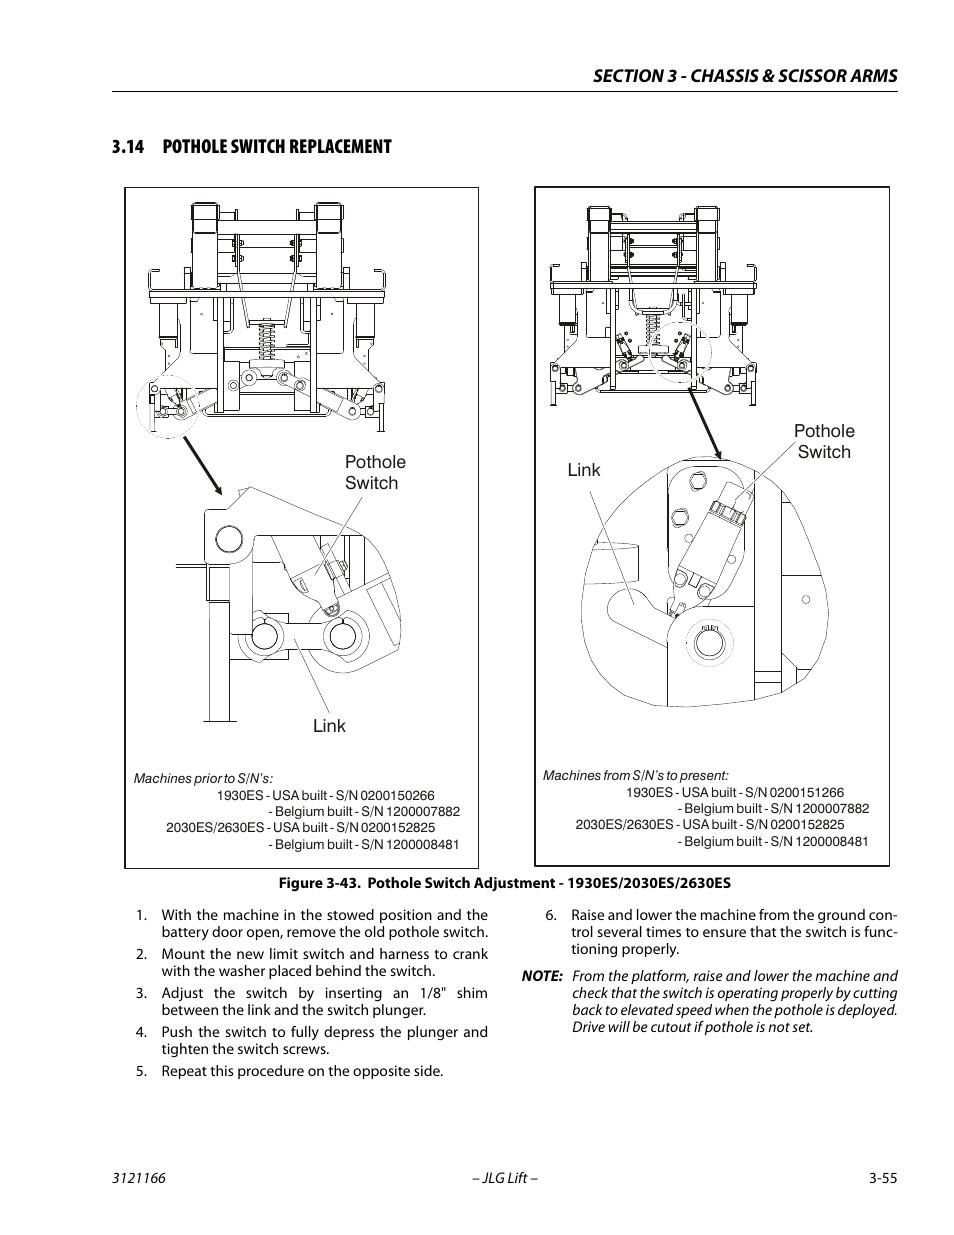 jlg 2632e2 wiring diagram trusted wiring diagram jlg 40h wiring-diagram jlg  2632e2 wiring diagram